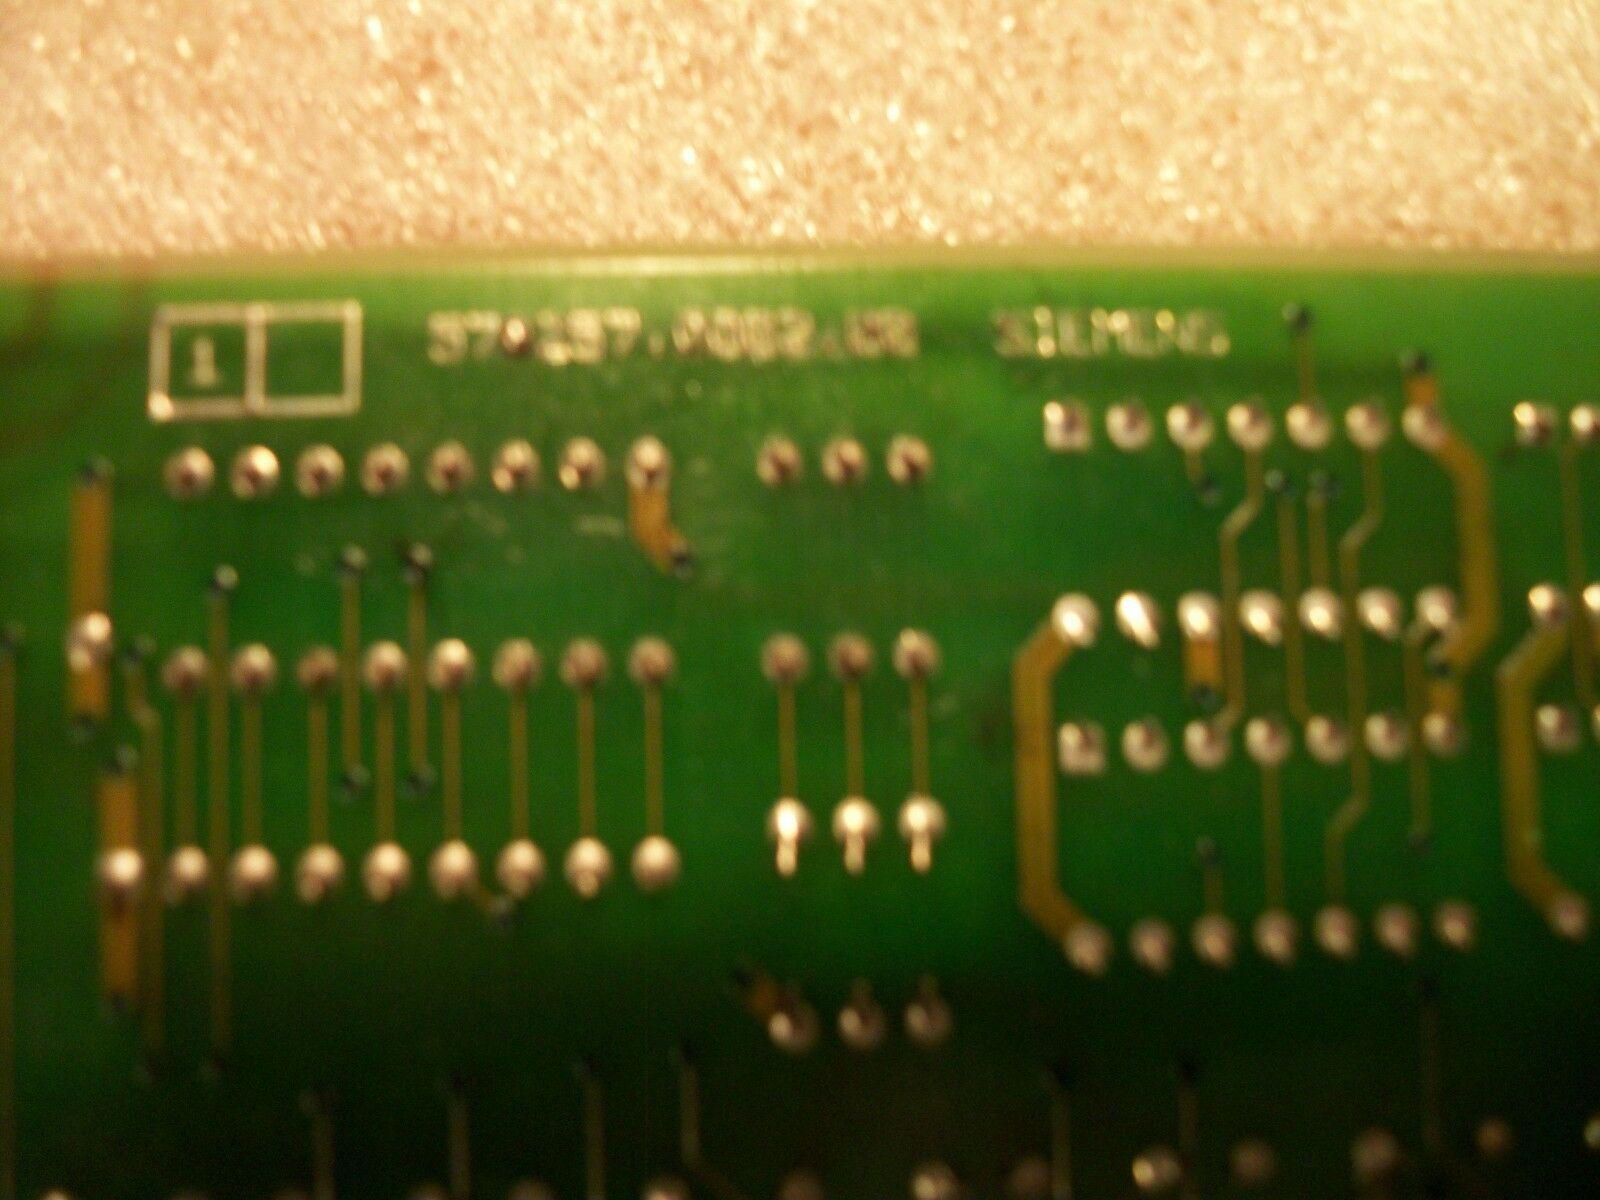 Siemens CNC Control Circuit Board 570 257 9101.00 / OE 570257.0002.00